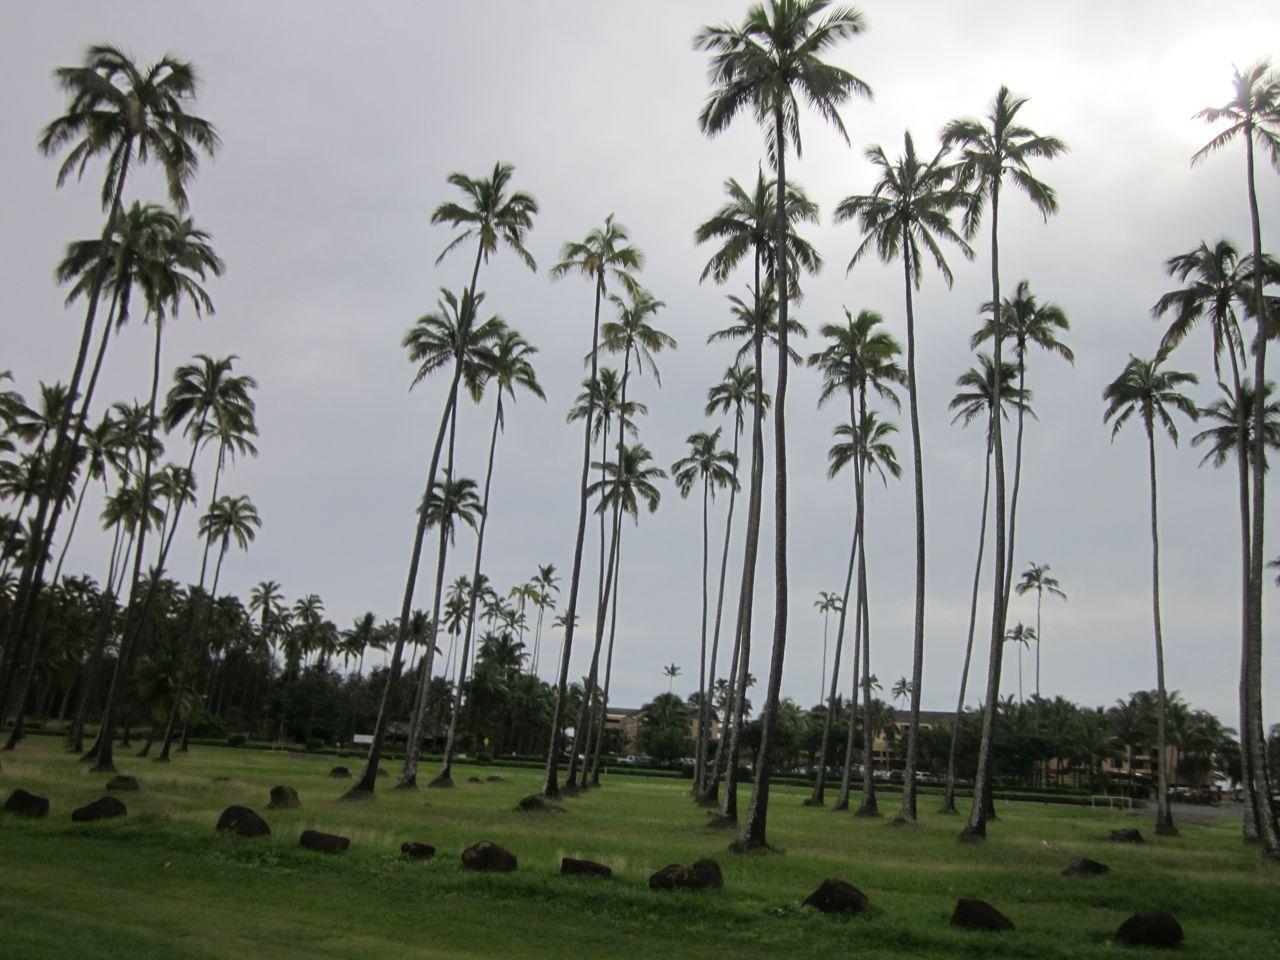 KAUAI, HAWAII: The Coco Palms on Kauai - Where Elvis filmed Blue Hawaii. Magical.